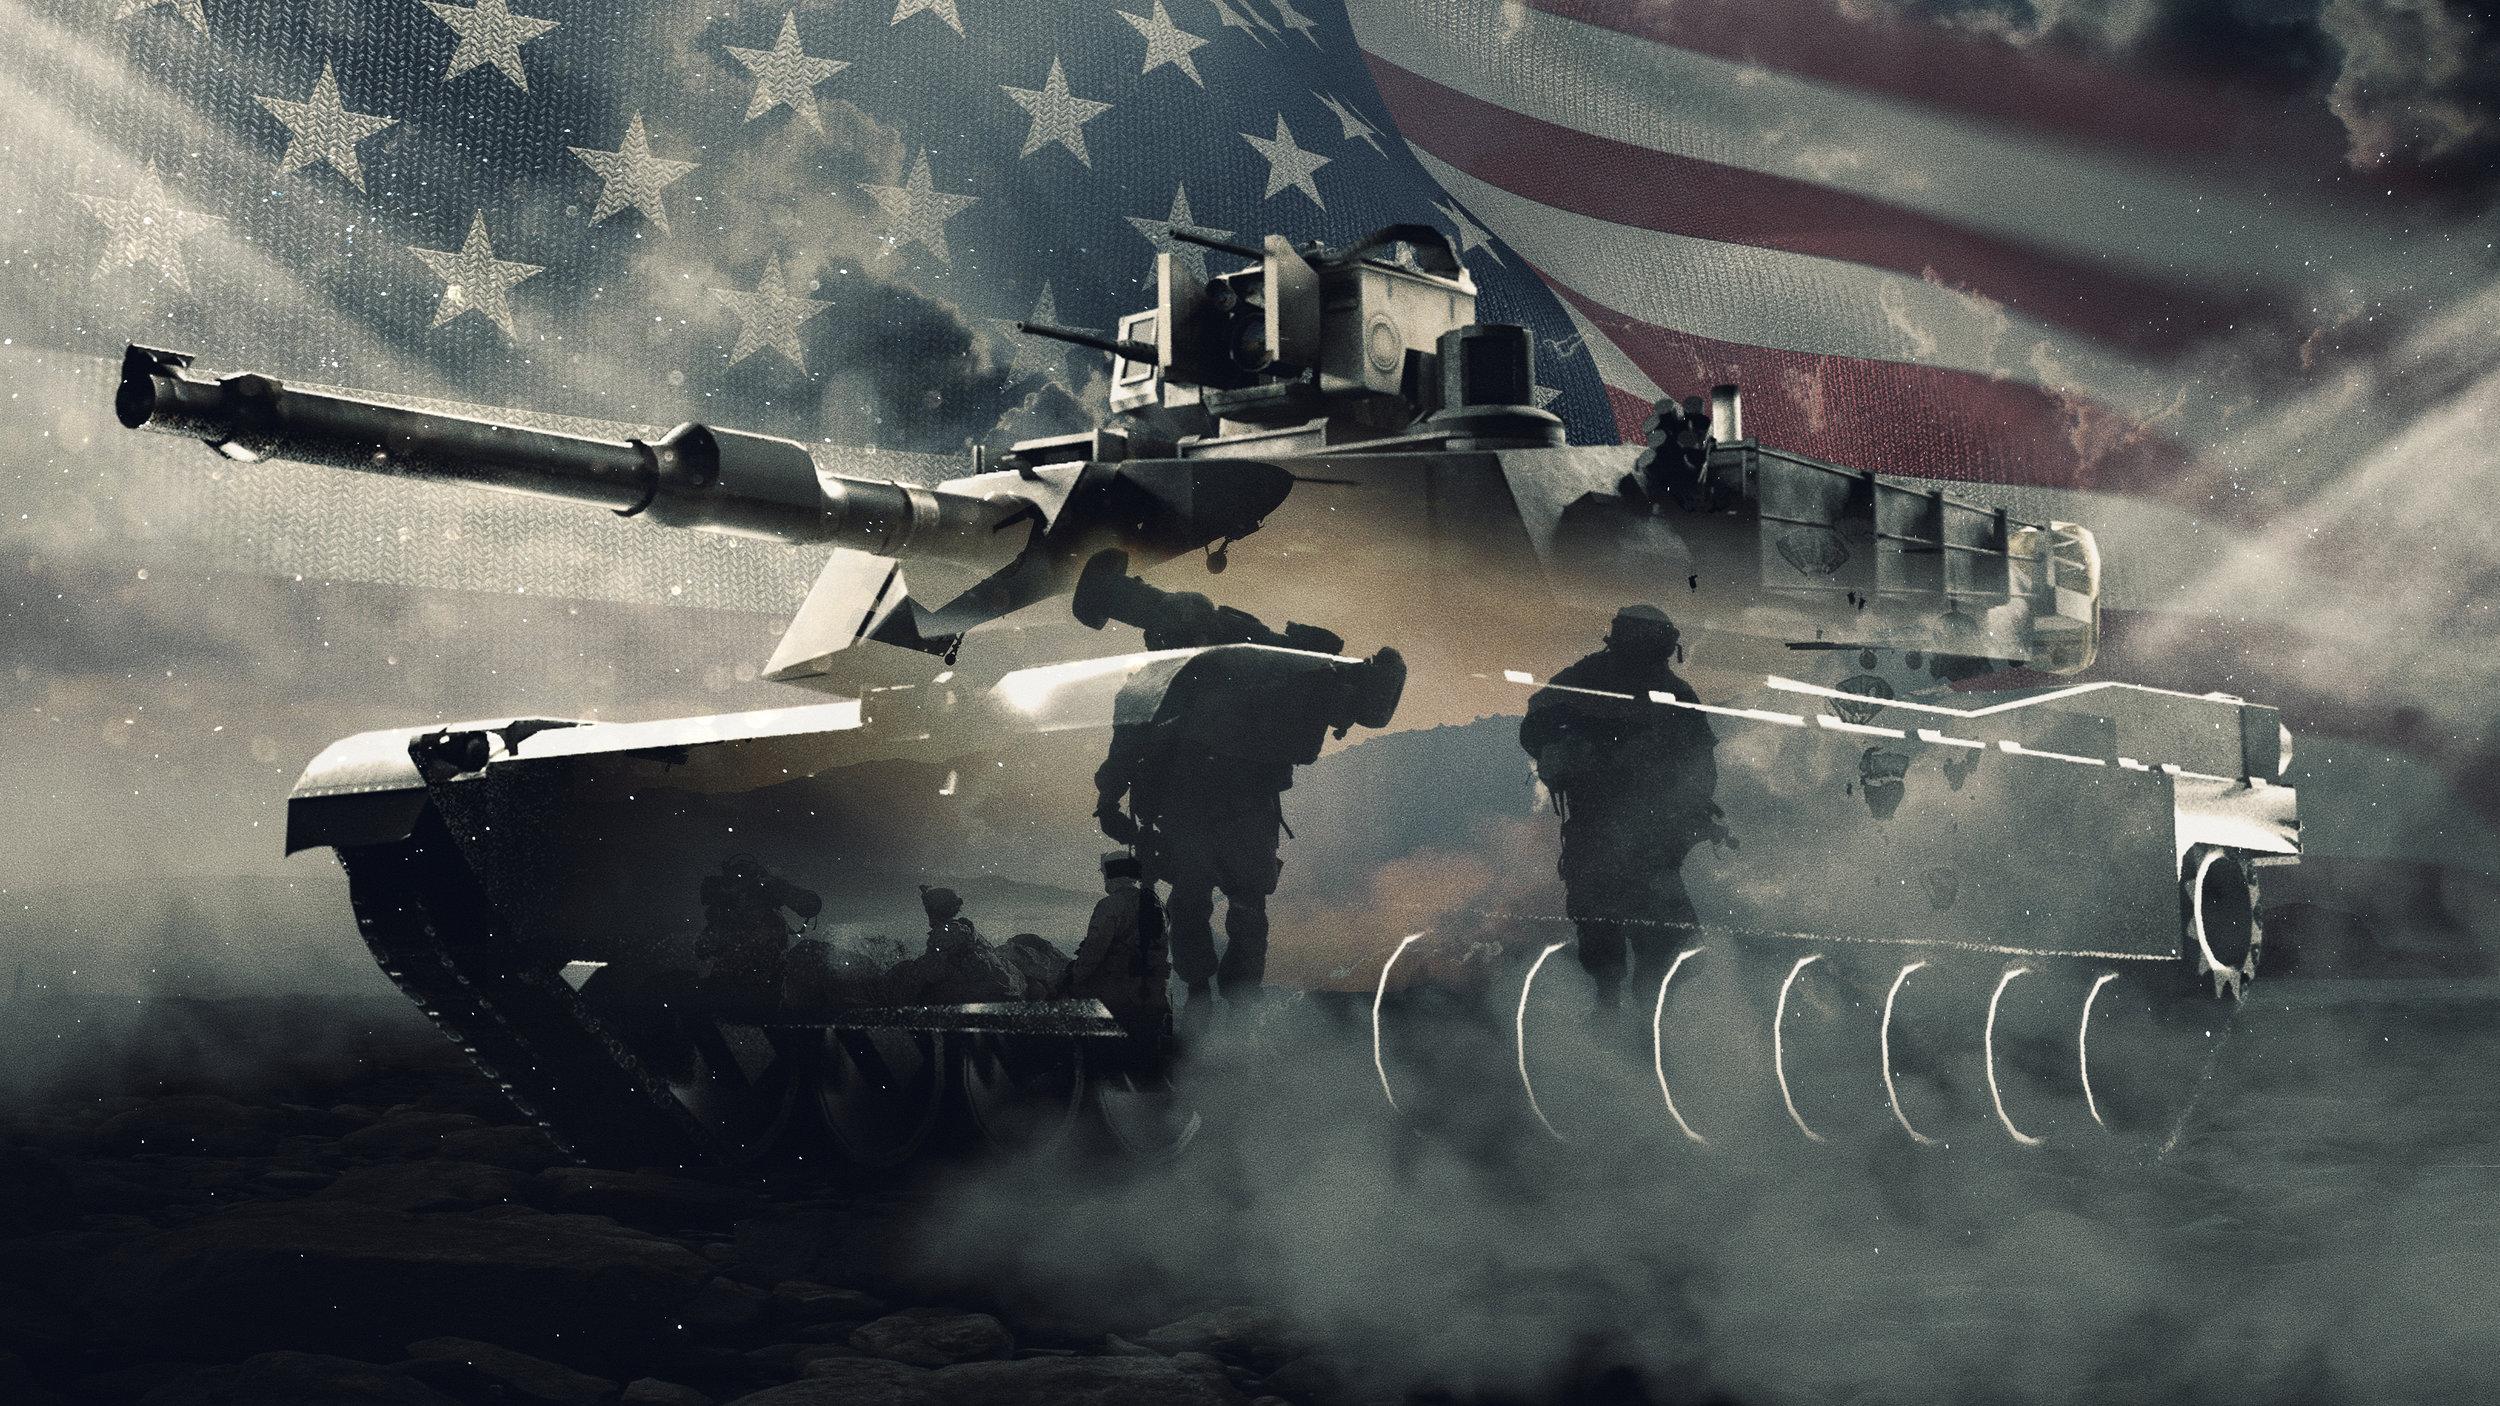 Classic Military Collage - C1